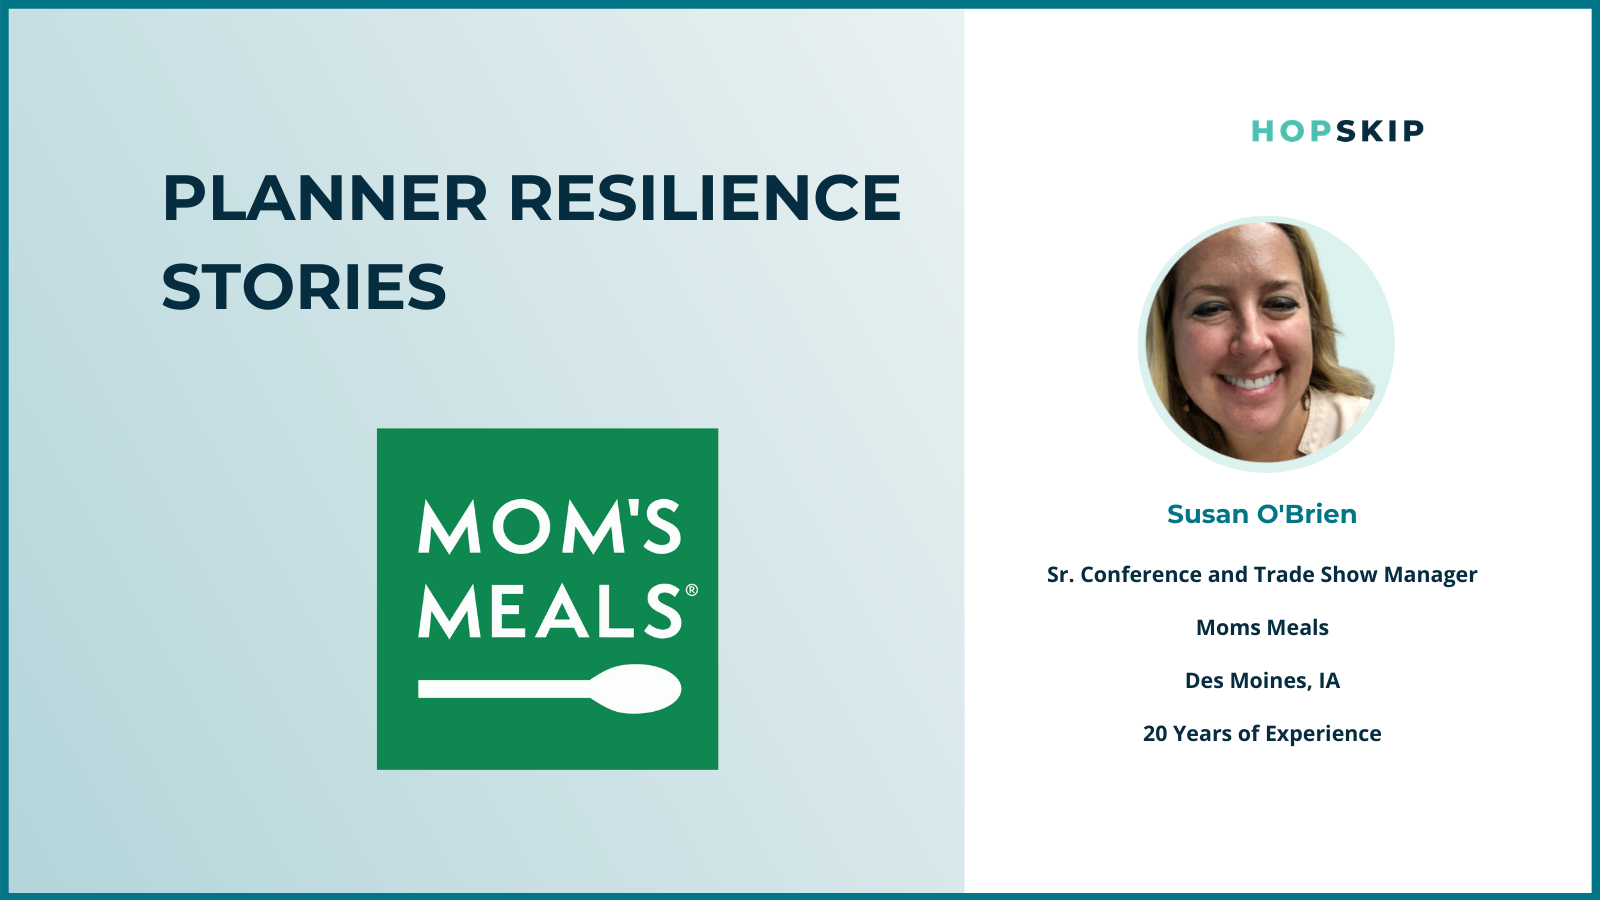 Susan Obrien Moms Meals